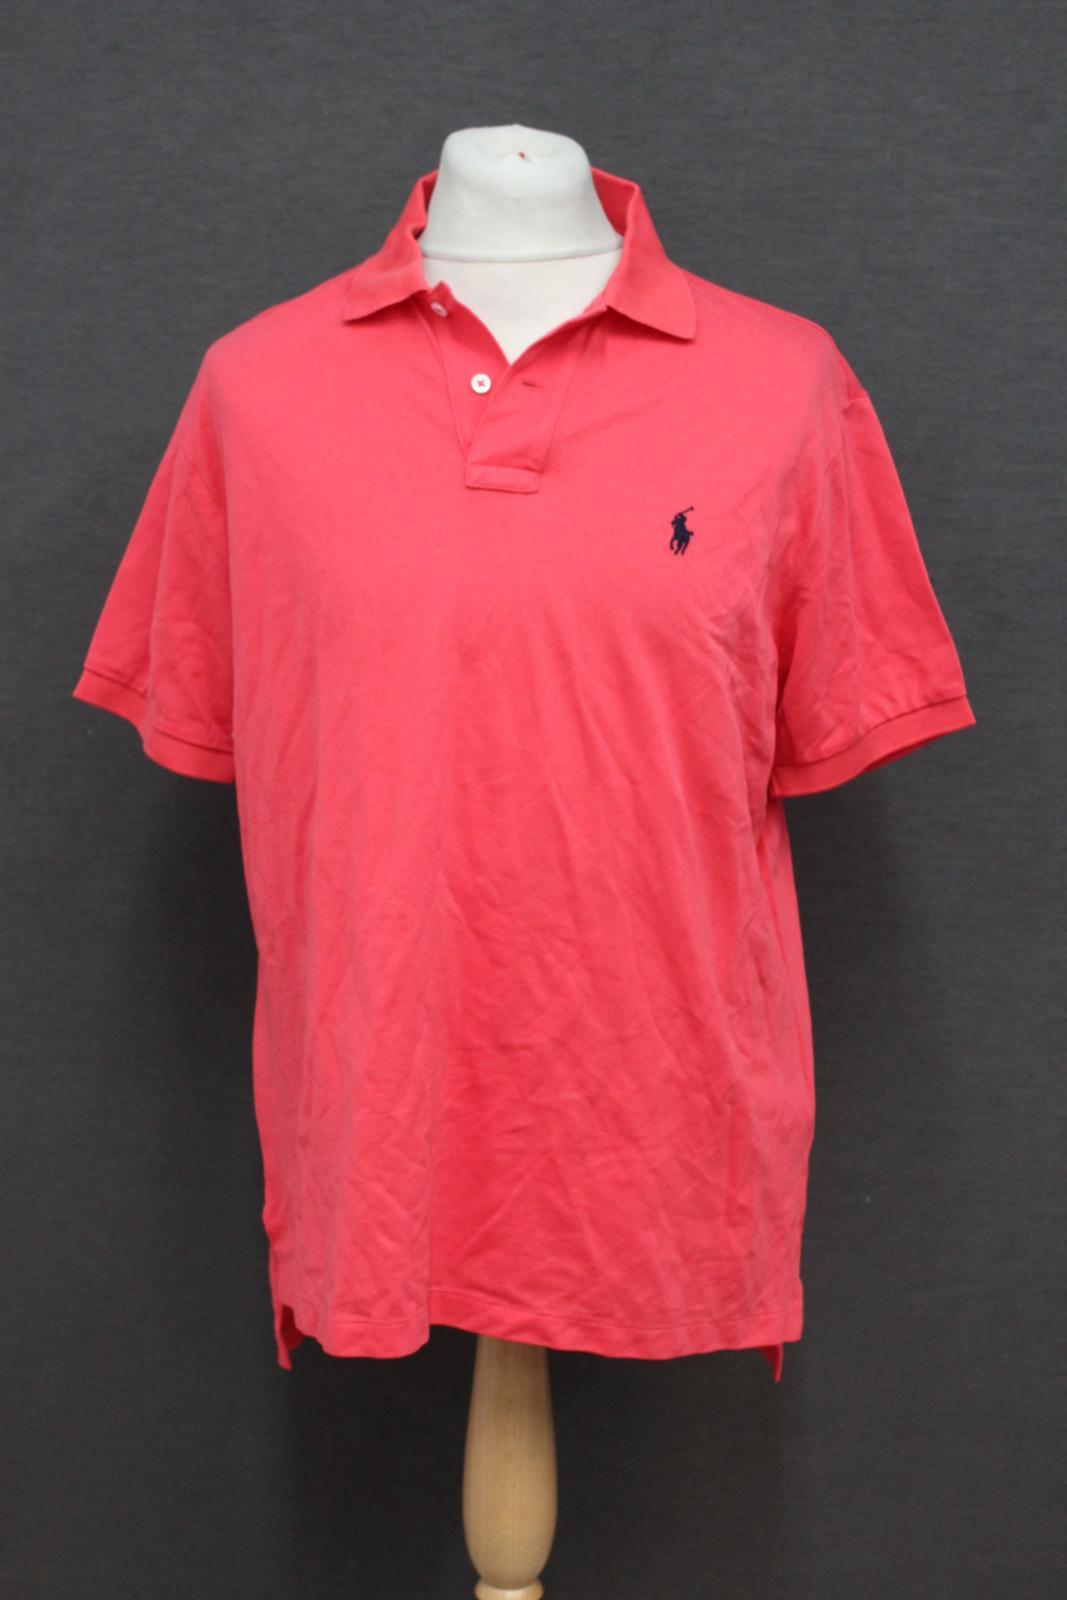 Ralph-Lauren-Polo-para-hombre-de-color-rosa-de-algodon-Manga-Corta-Camisa-Polo-De-Ajuste miniatura 12